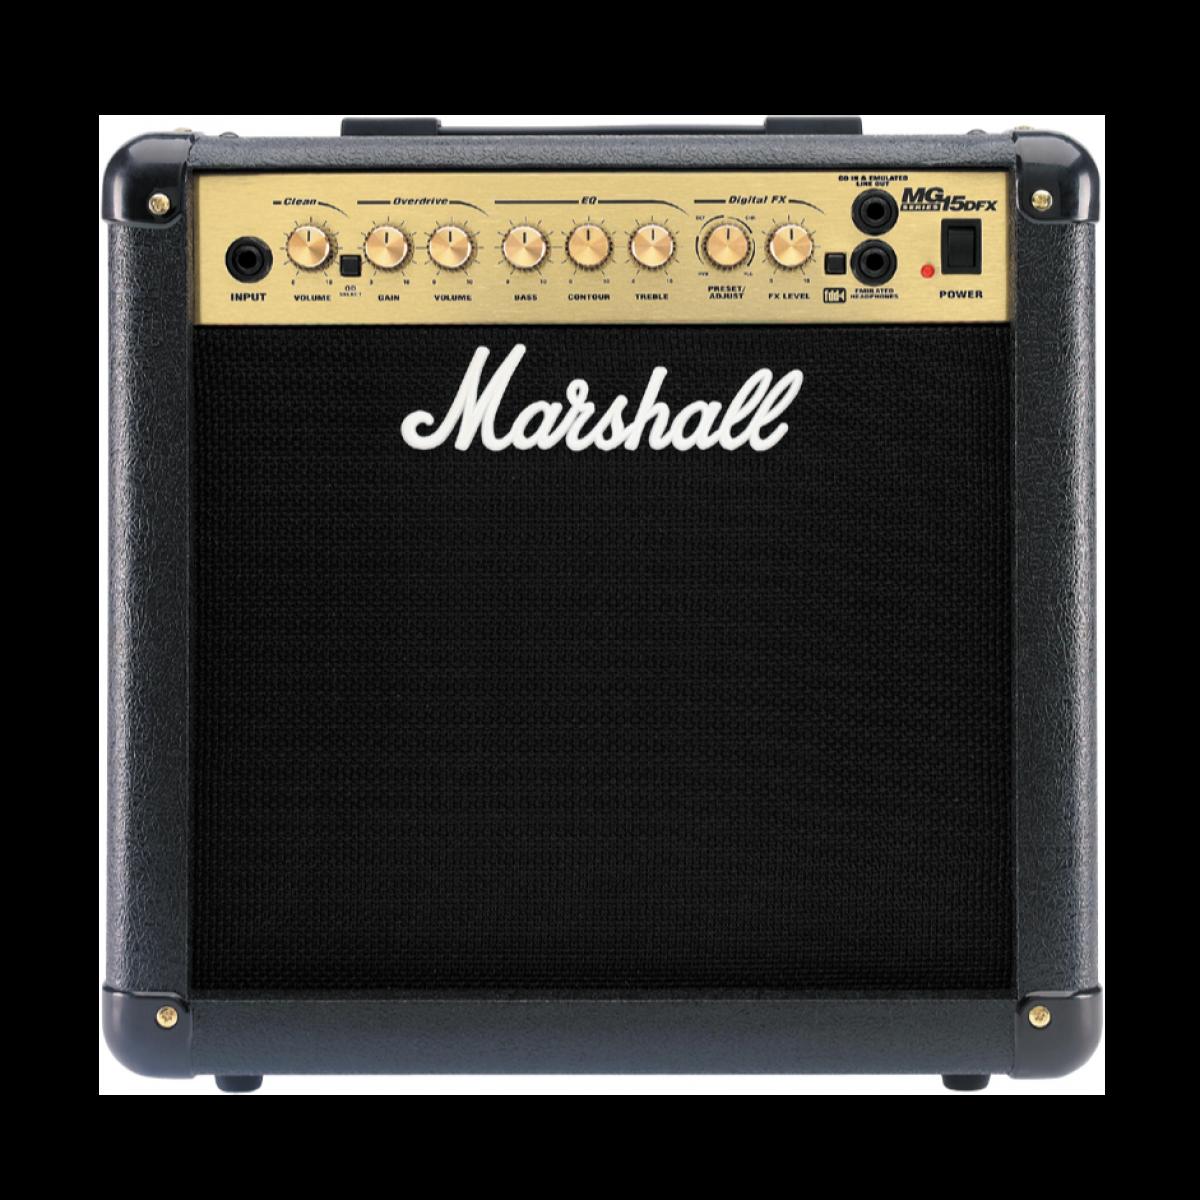 marshall mg15dfx combo amp guitar amps guitars. Black Bedroom Furniture Sets. Home Design Ideas